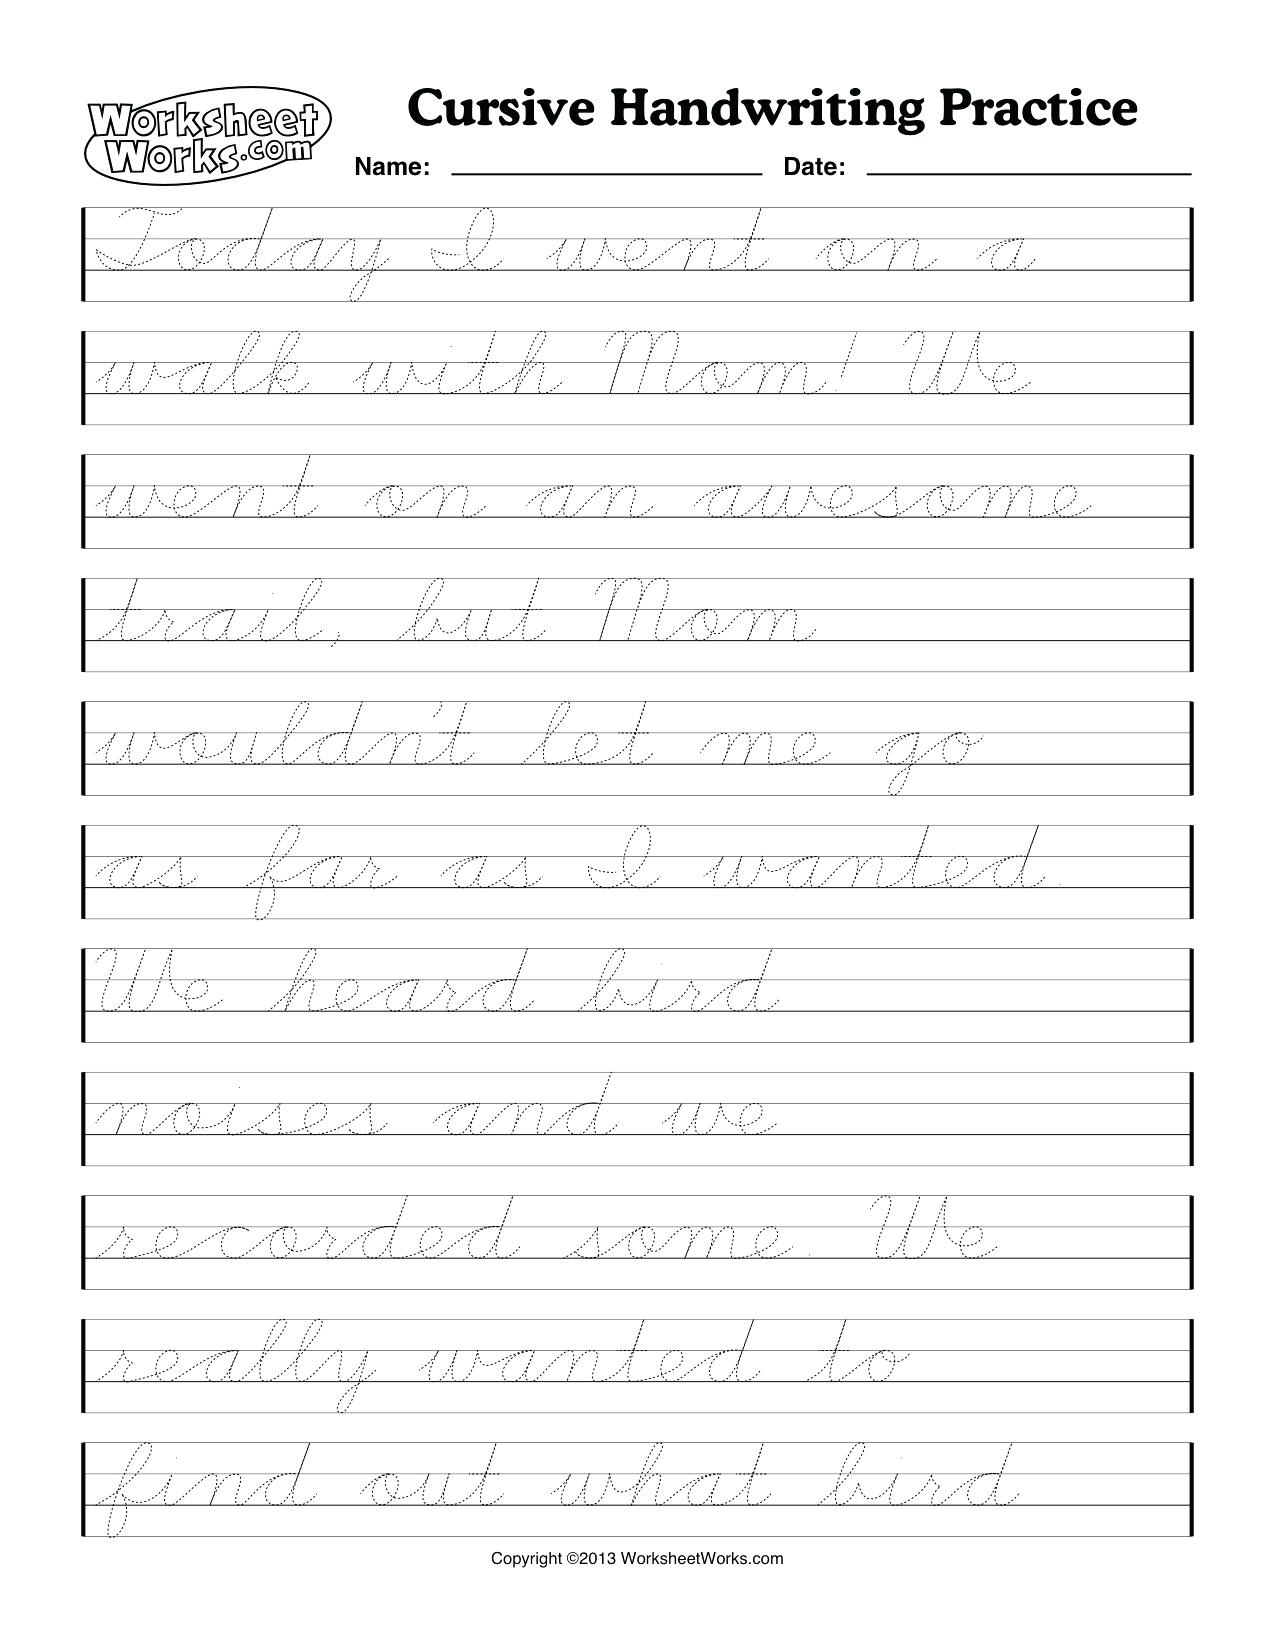 54 Unique Of Free Printable Cursive Handwriting Worksheets